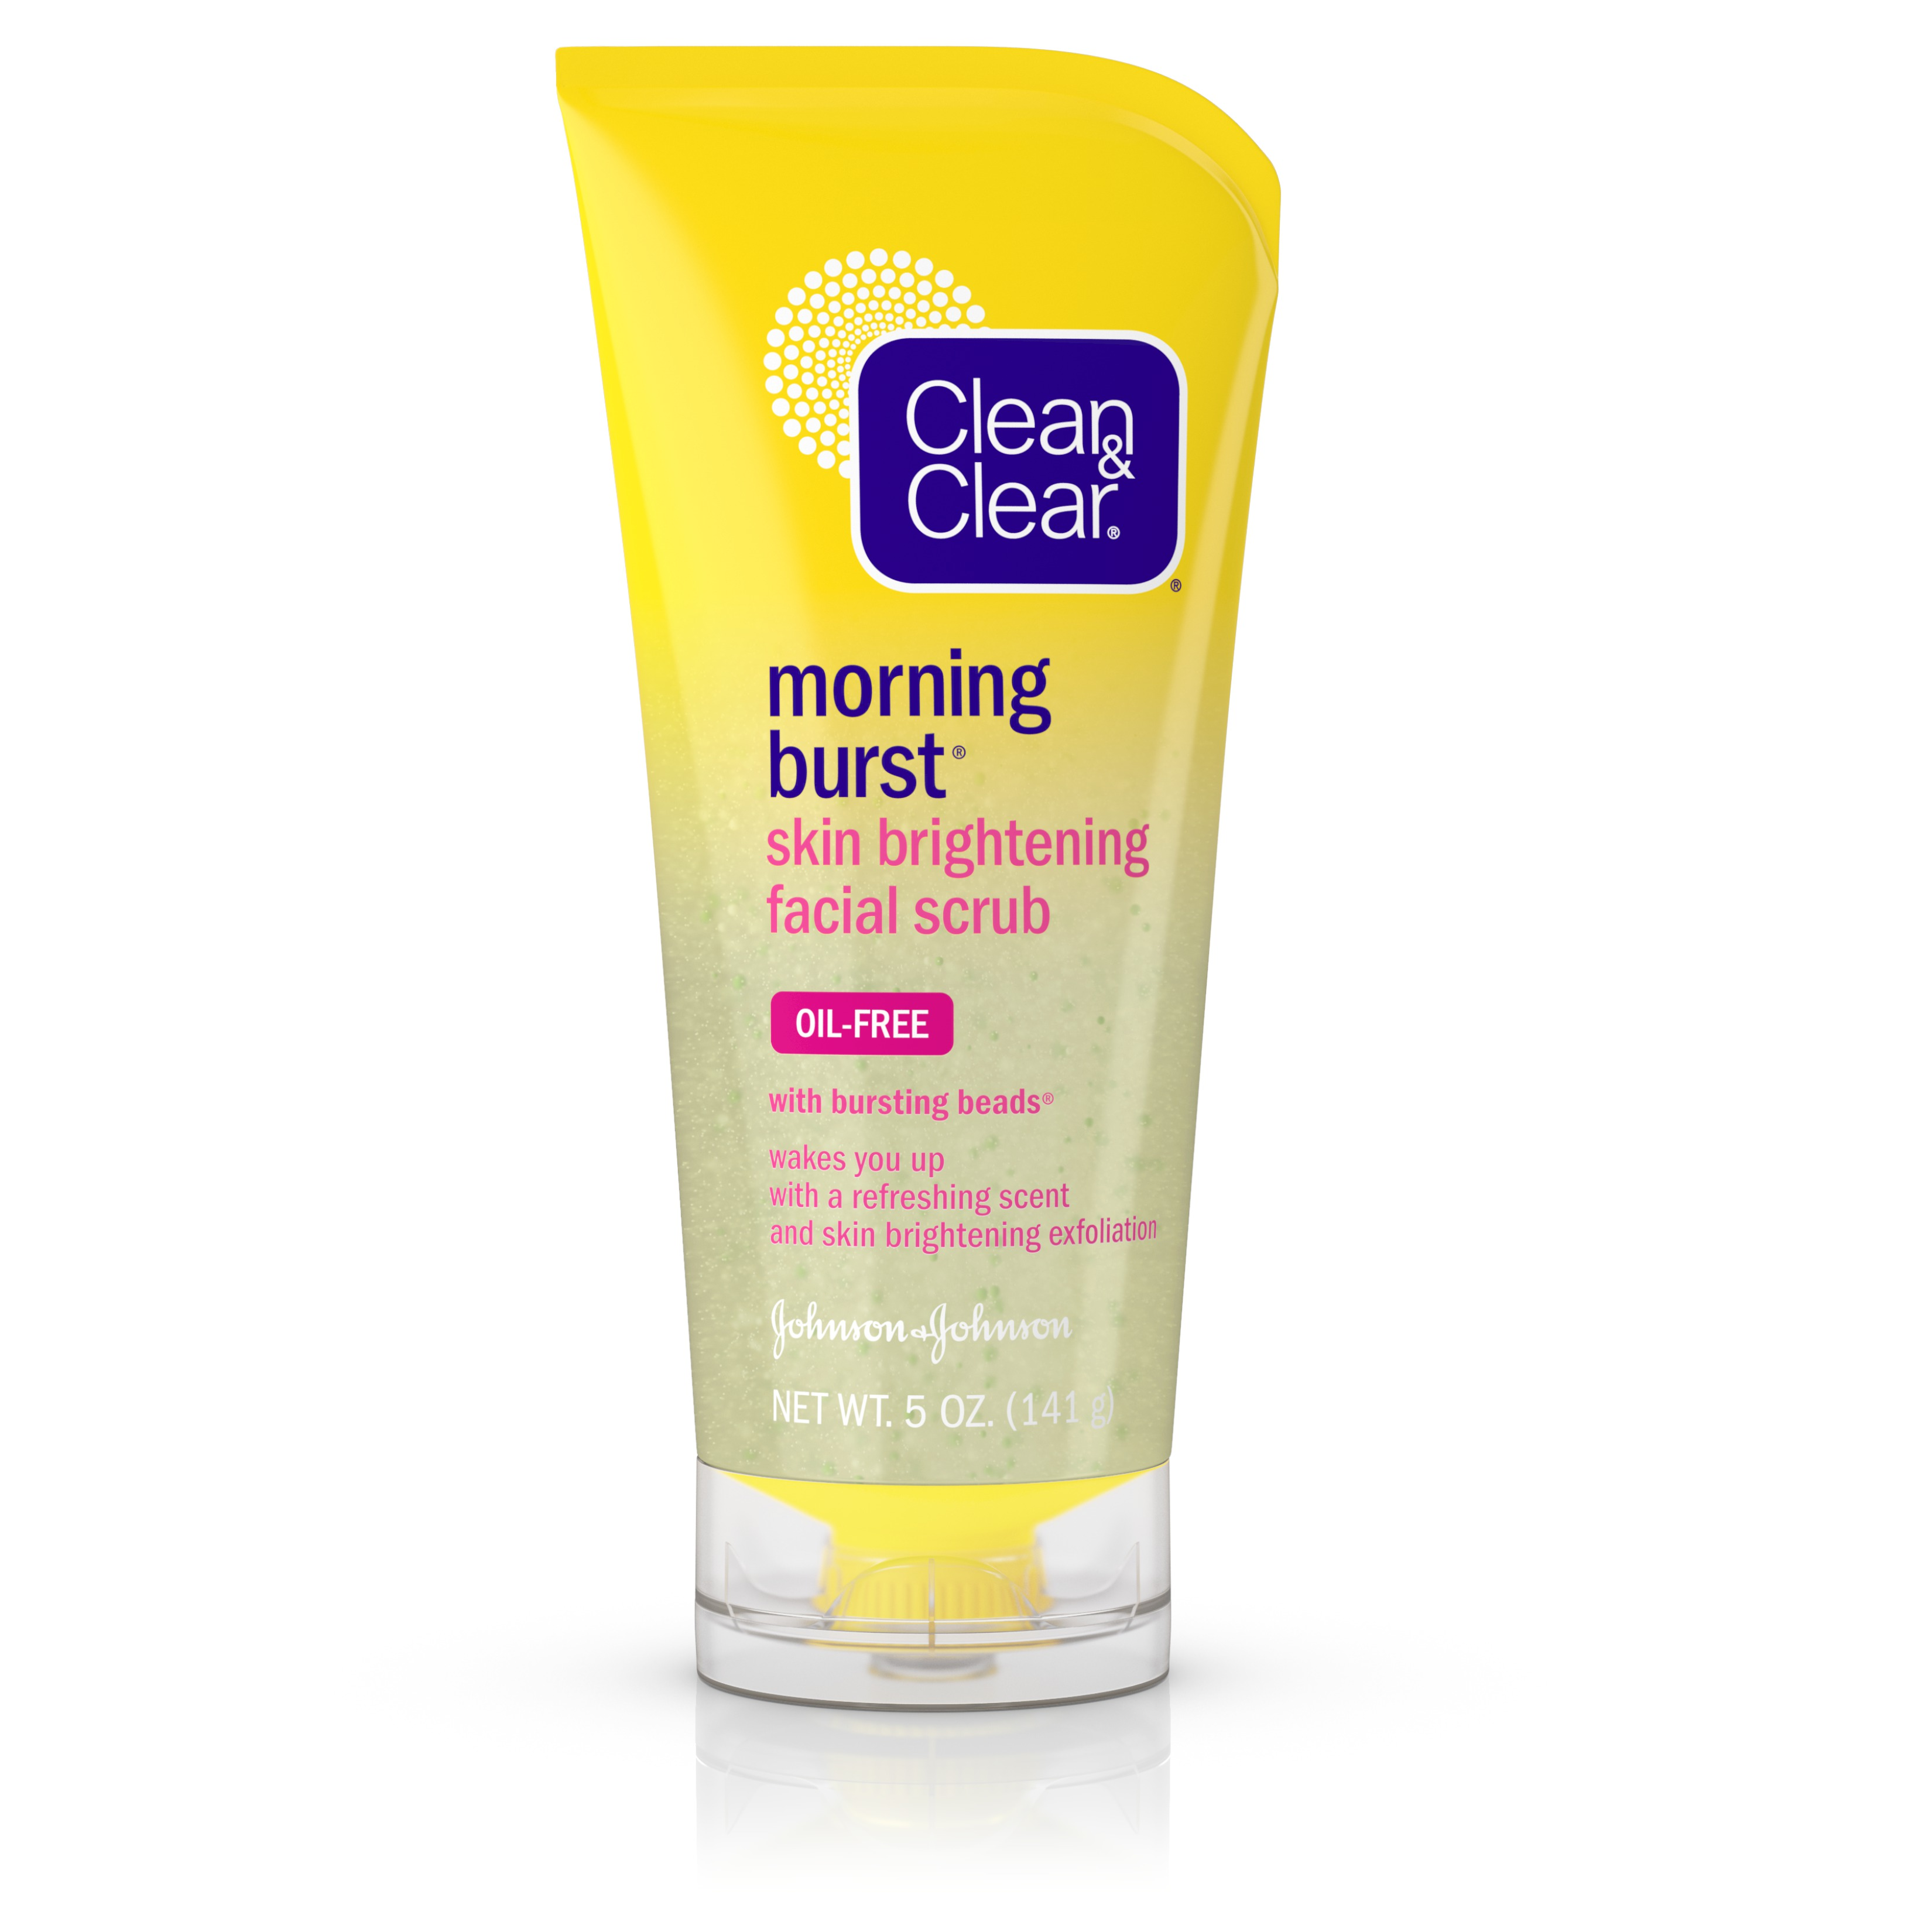 Clean & Clear Morning Burst Skin Brightening Facial Scrub For Clear Skin, 5 Oz.